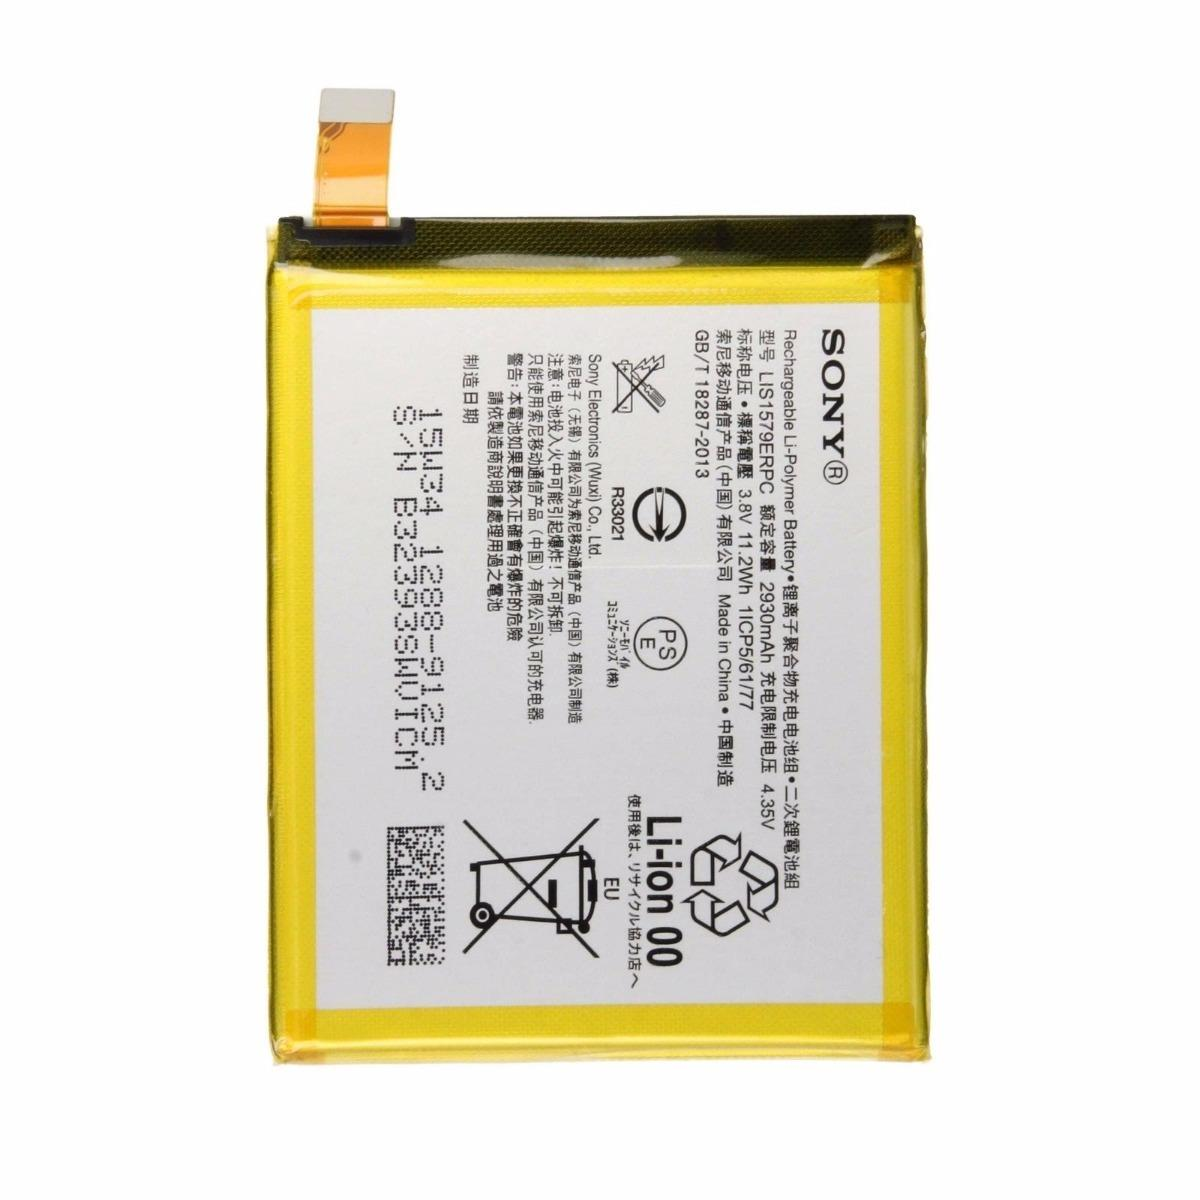 Sony Baterai / Battery Sony Xperia Z4 / Z3 PLUS Original - Kapasitas .